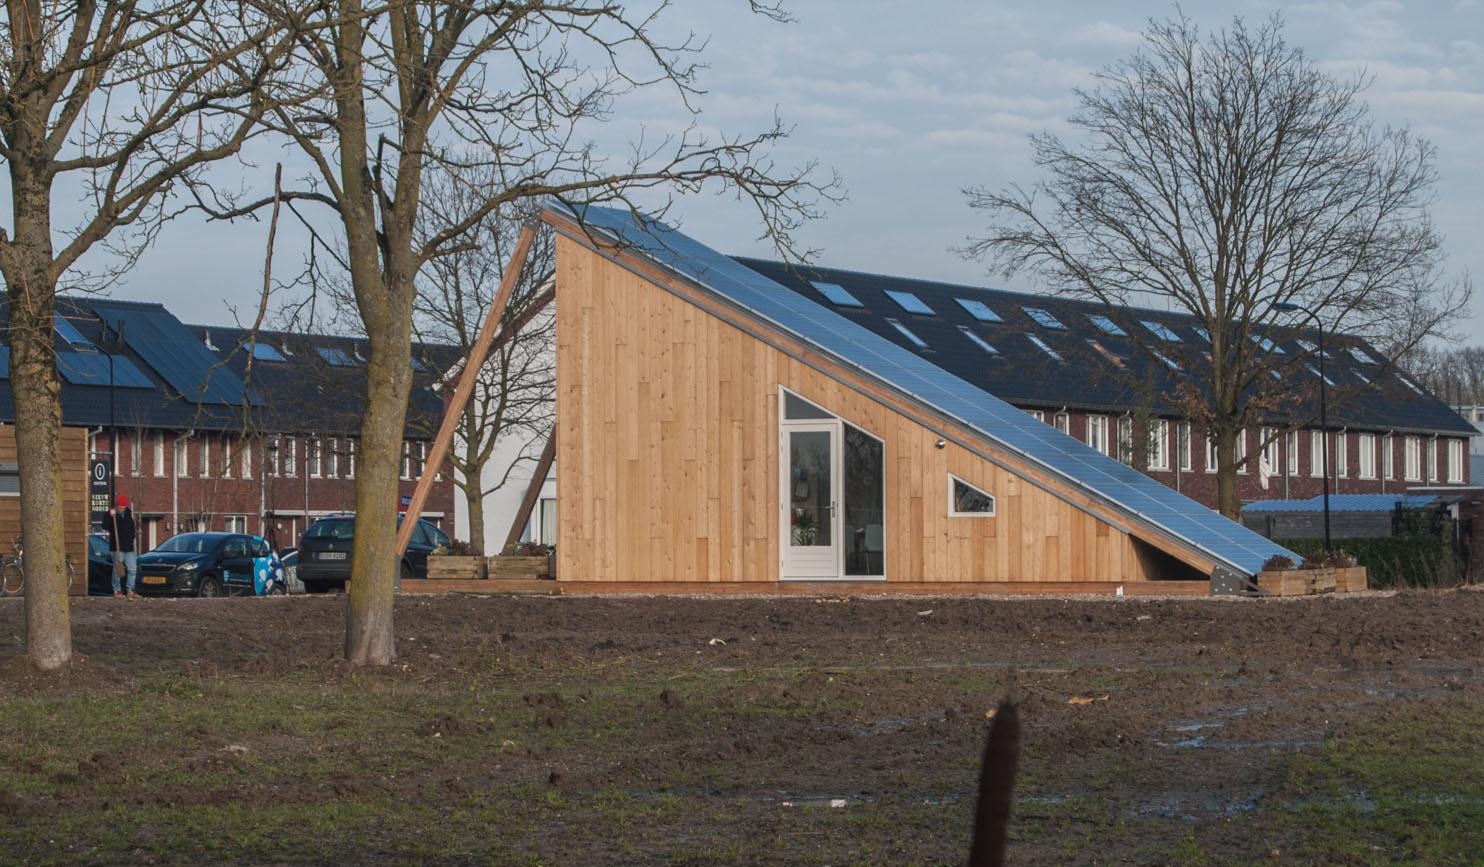 SolarCabin in Wageningen